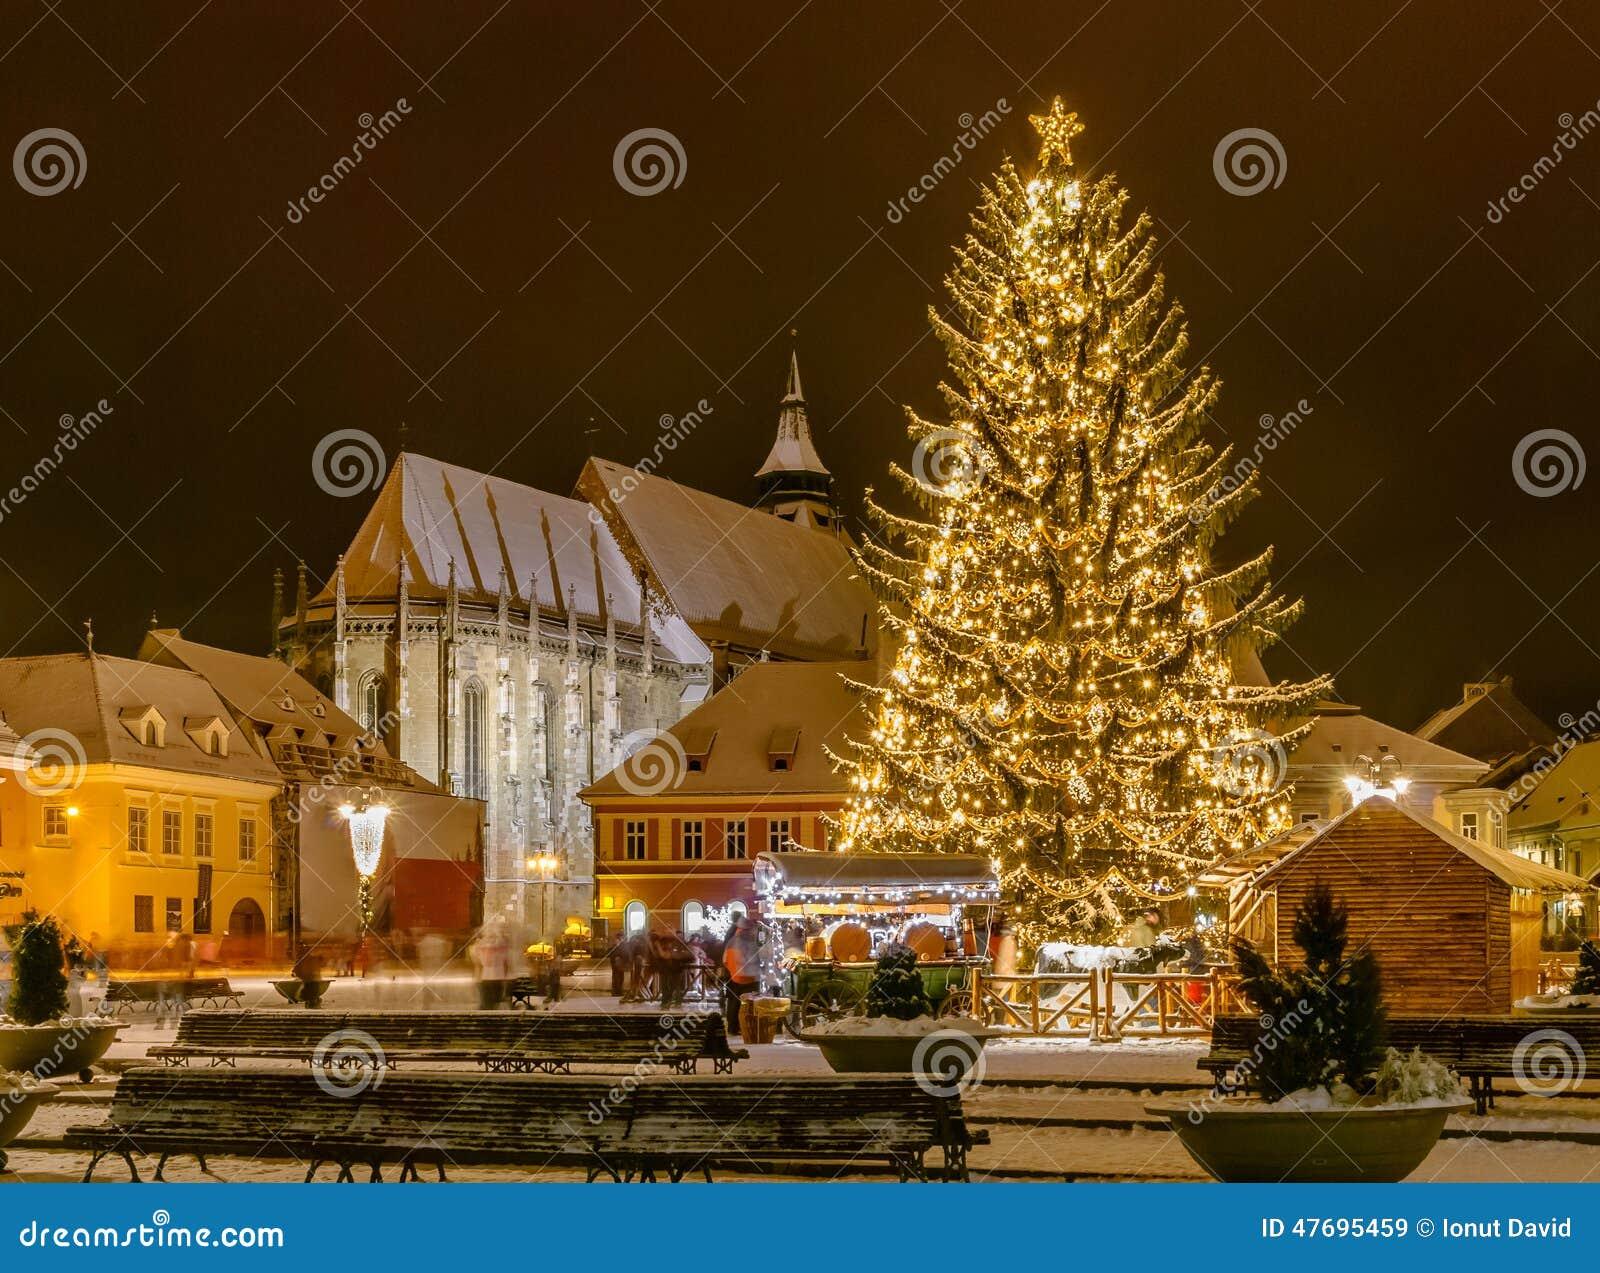 Brasov, Romania With An Old Christmas Tree Stock Photo 47695459 ...